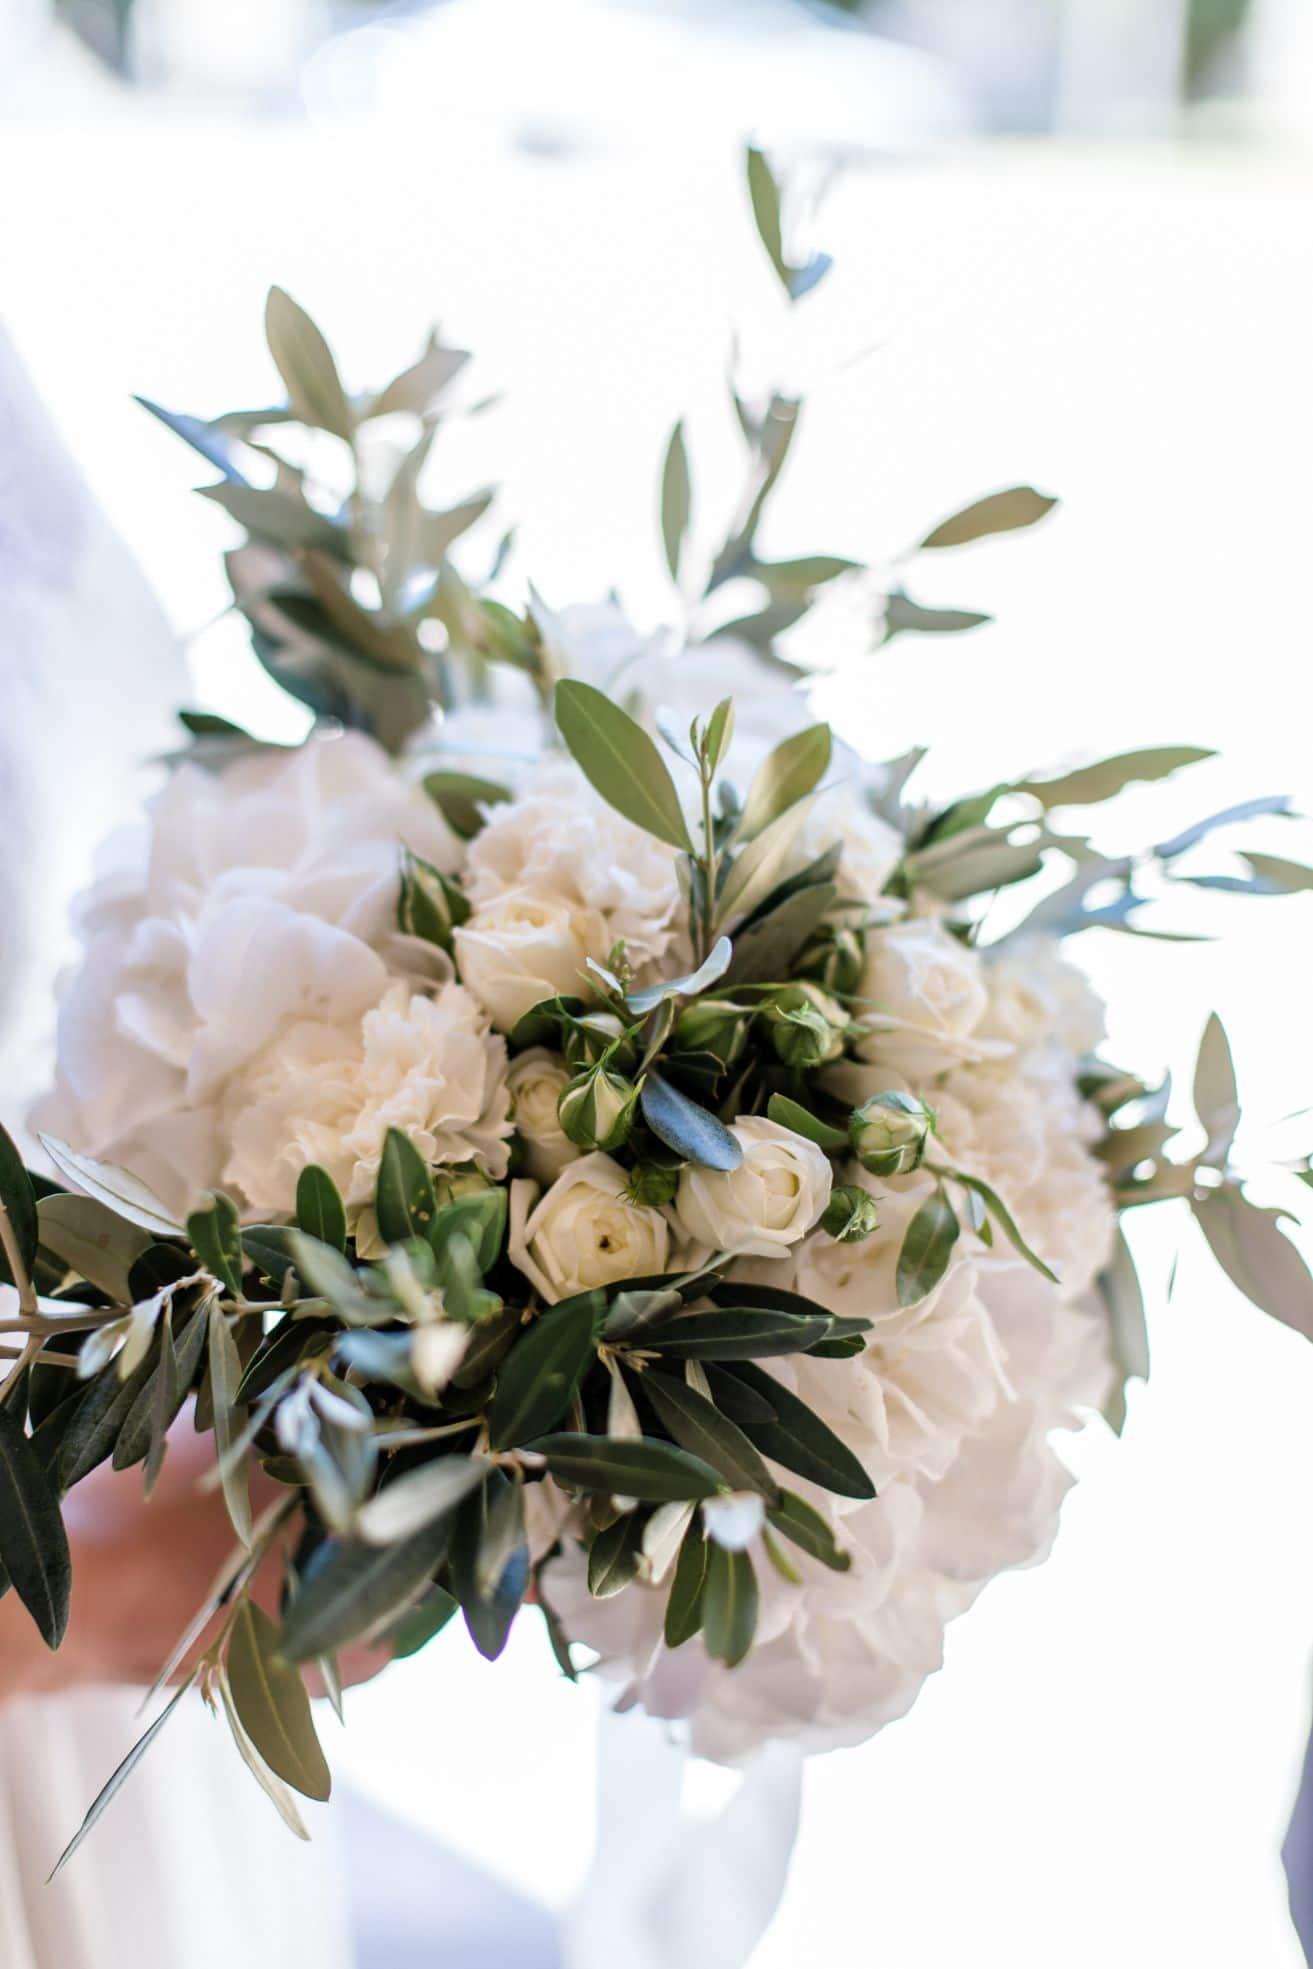 Million Memories_A&D_Hochzeitsfotograf_Schlosshochzeit_Toskana_Lago Di Como_Wedding_Tuscany_085